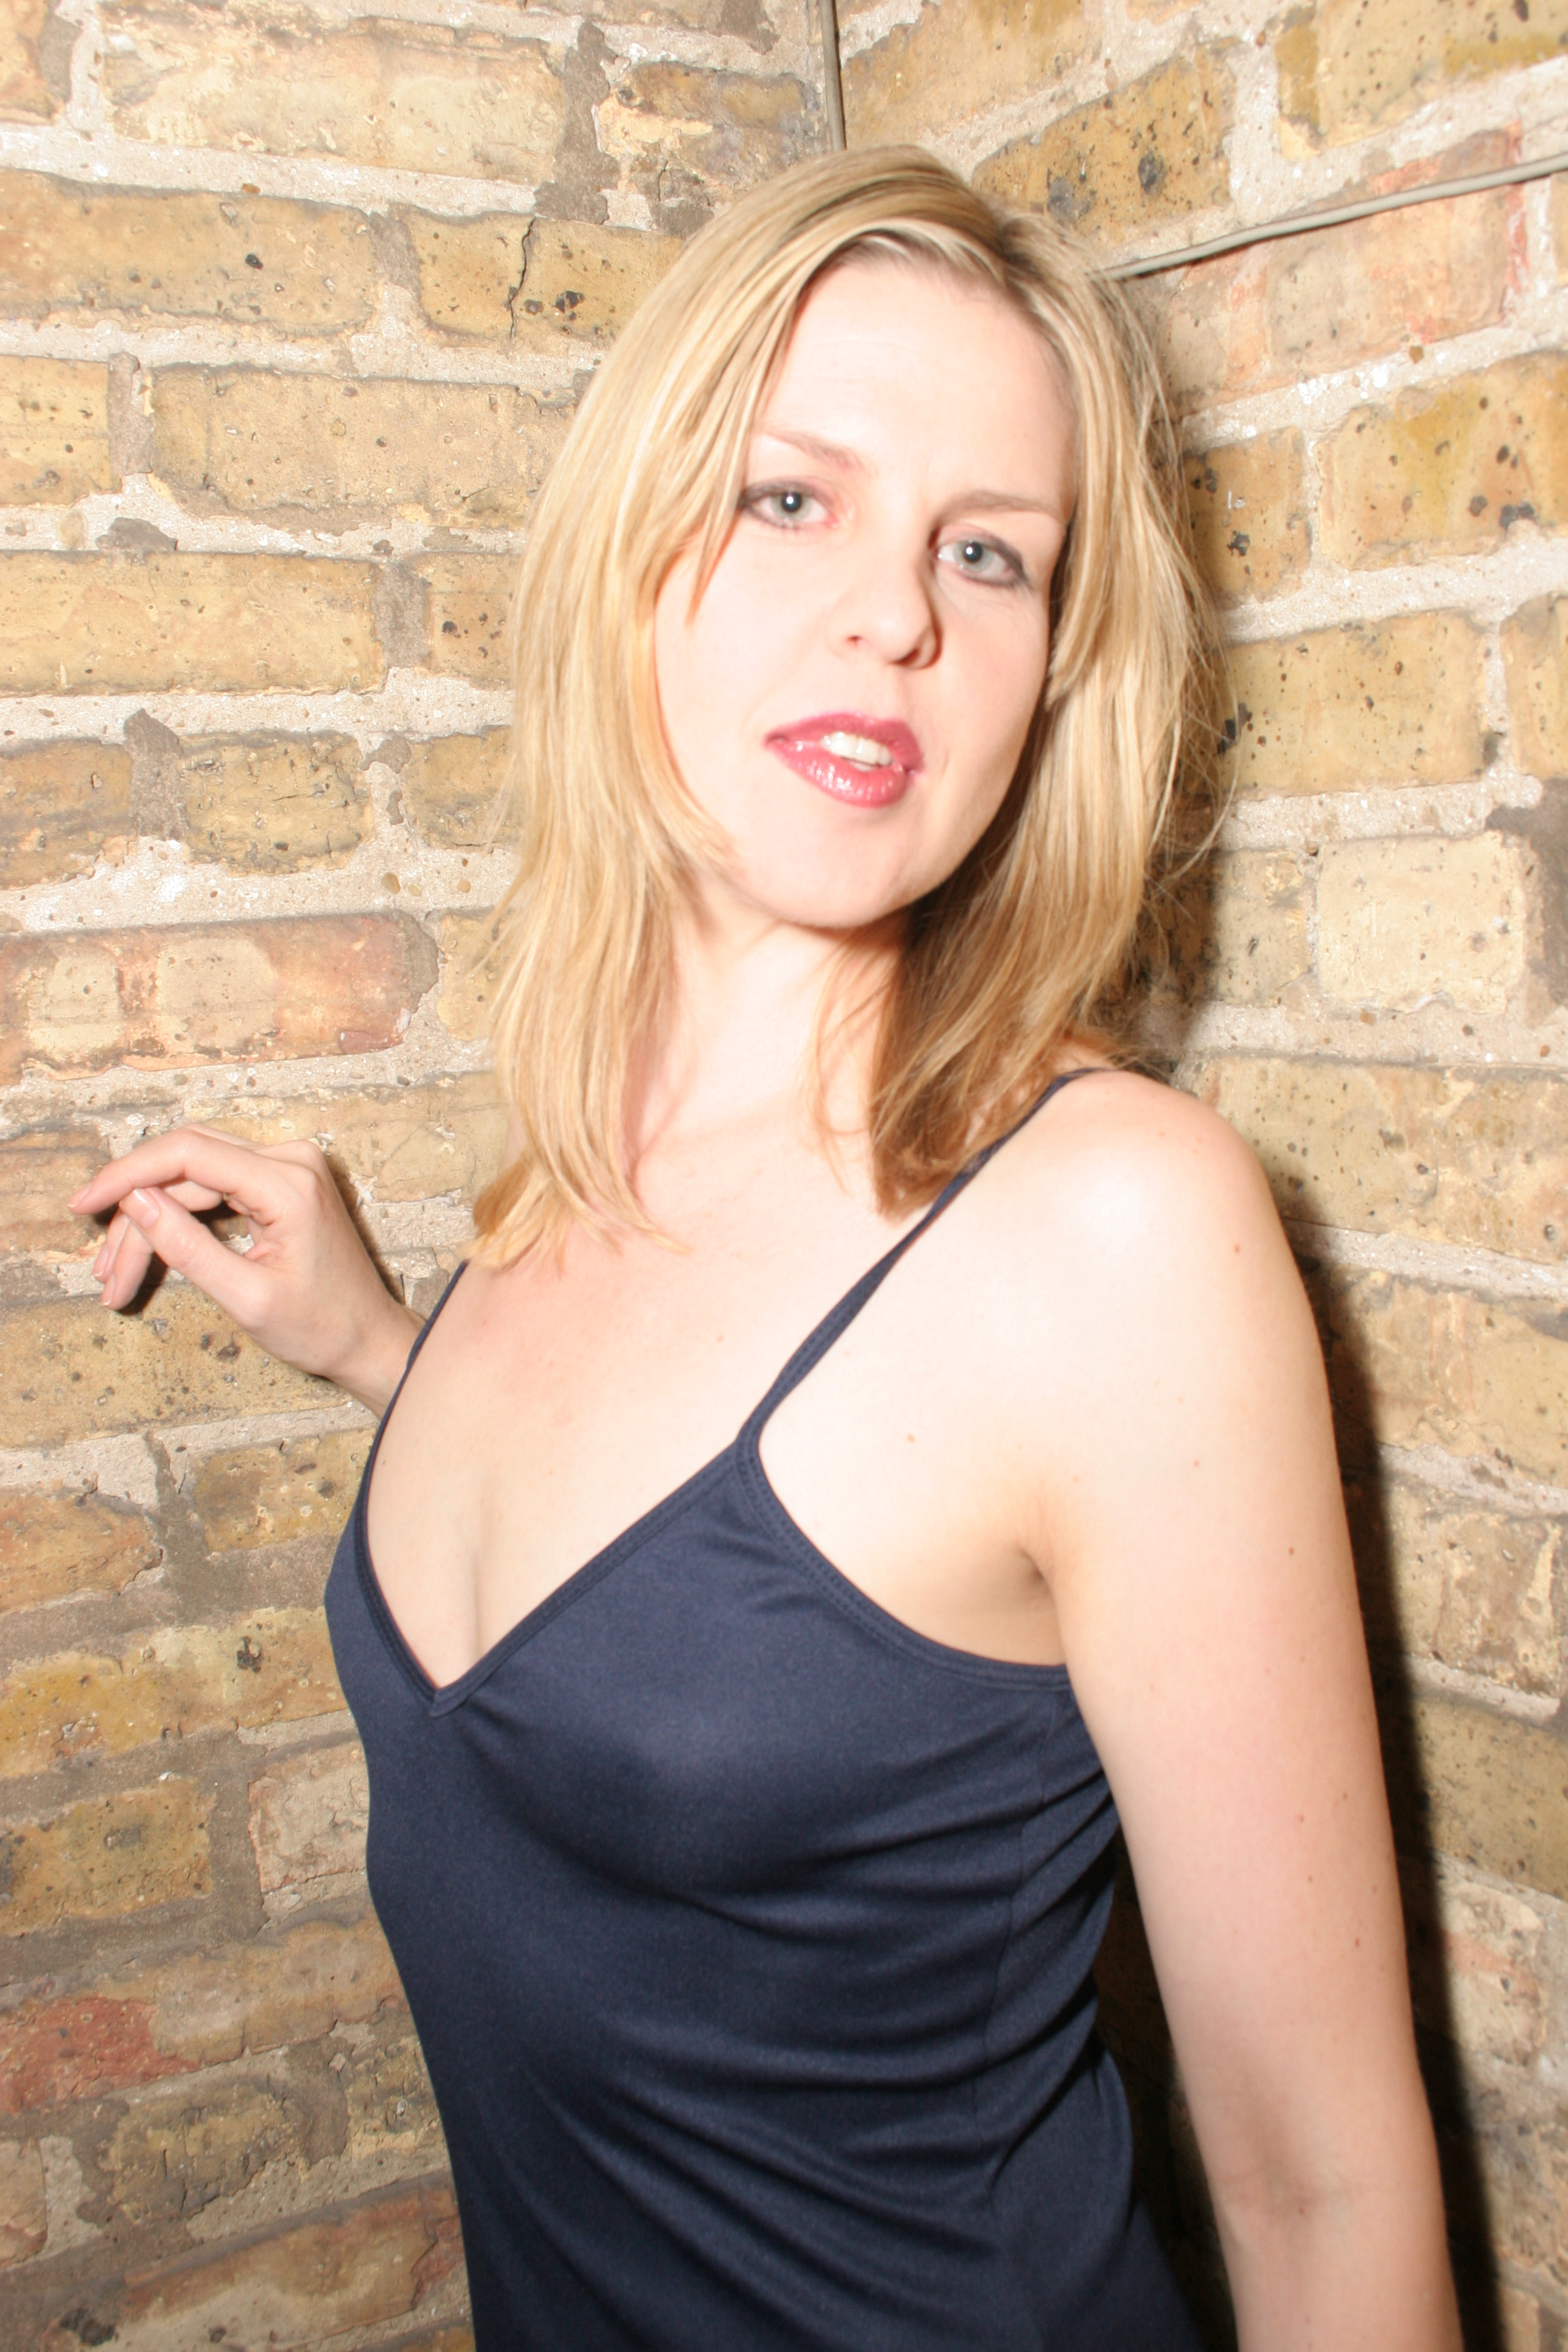 Blonde Poses - Anal Sex Movies